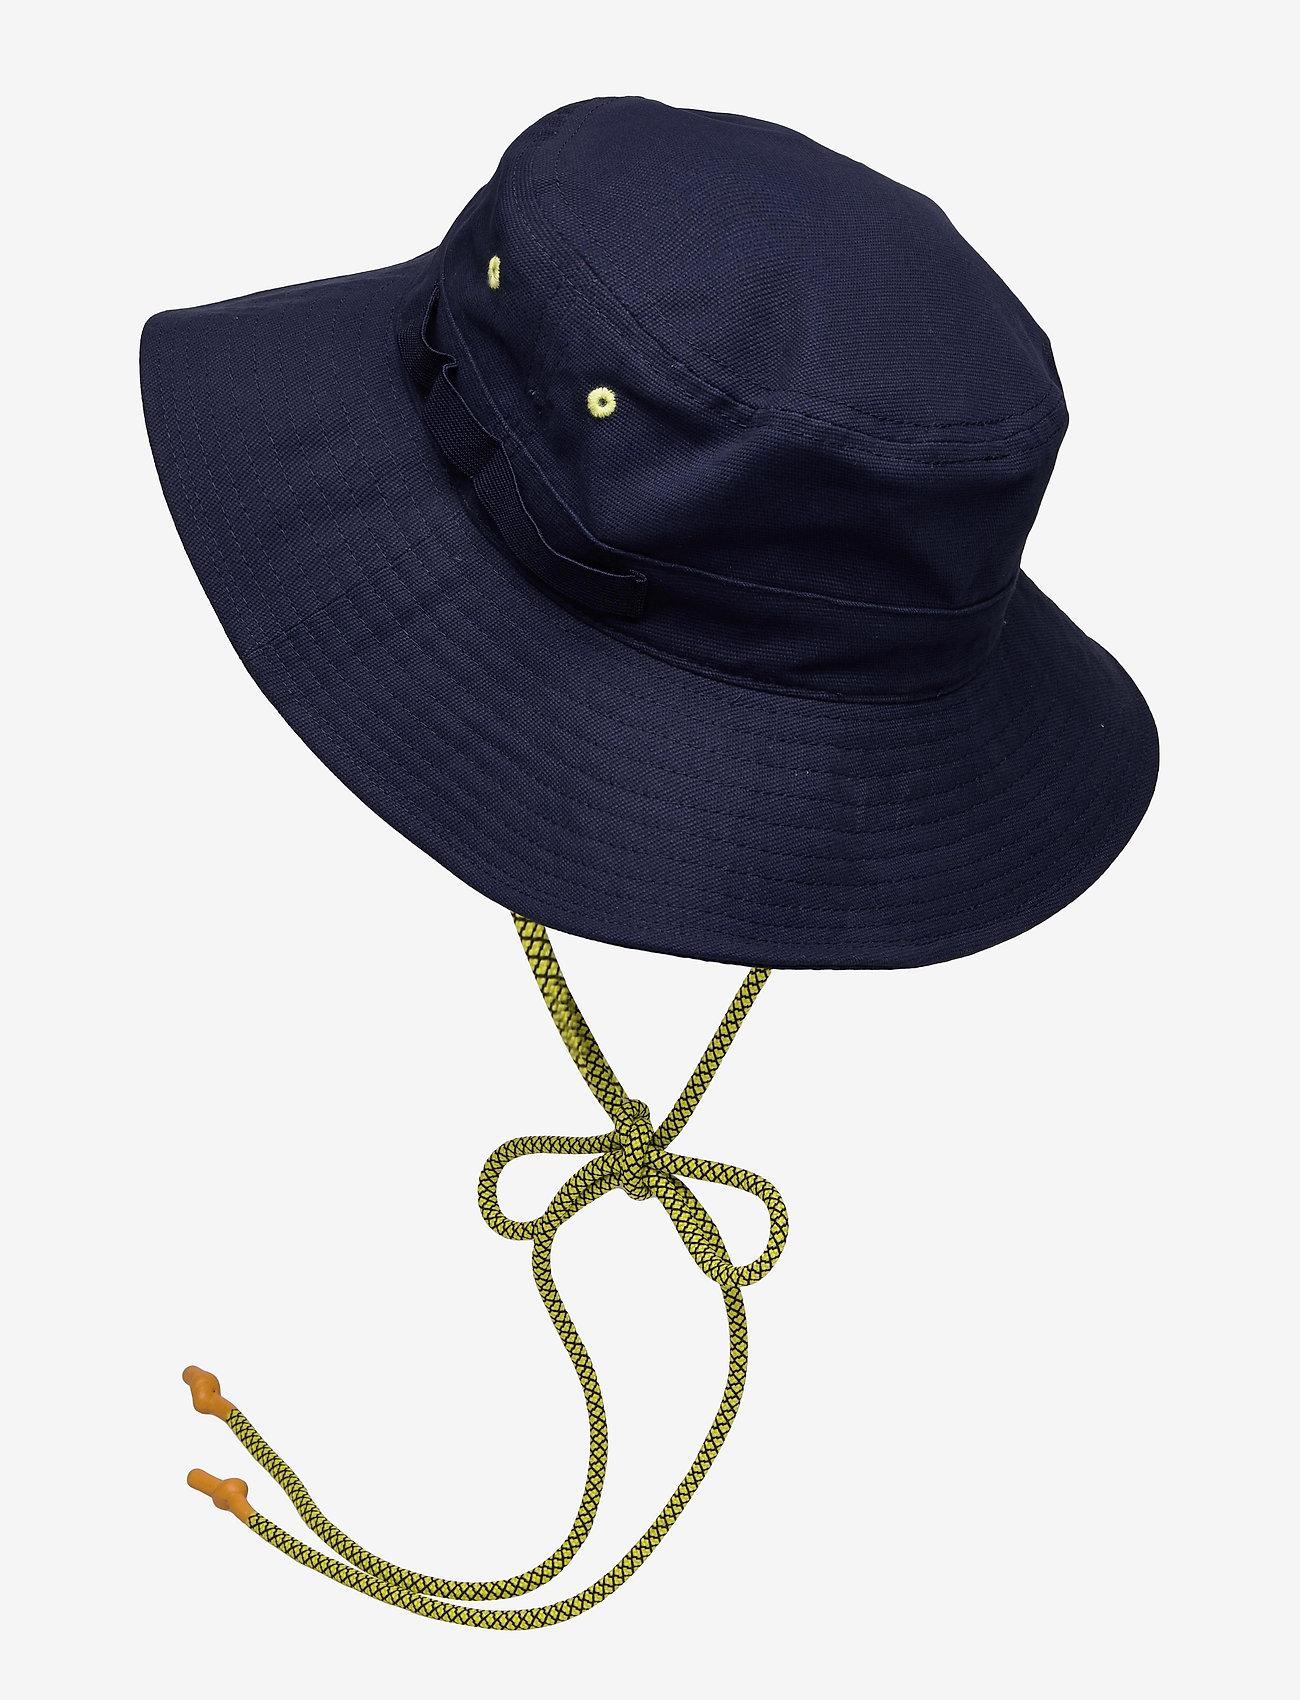 Kangol - KG UTILITY CORDS JUNGLE HAT - navy - 1